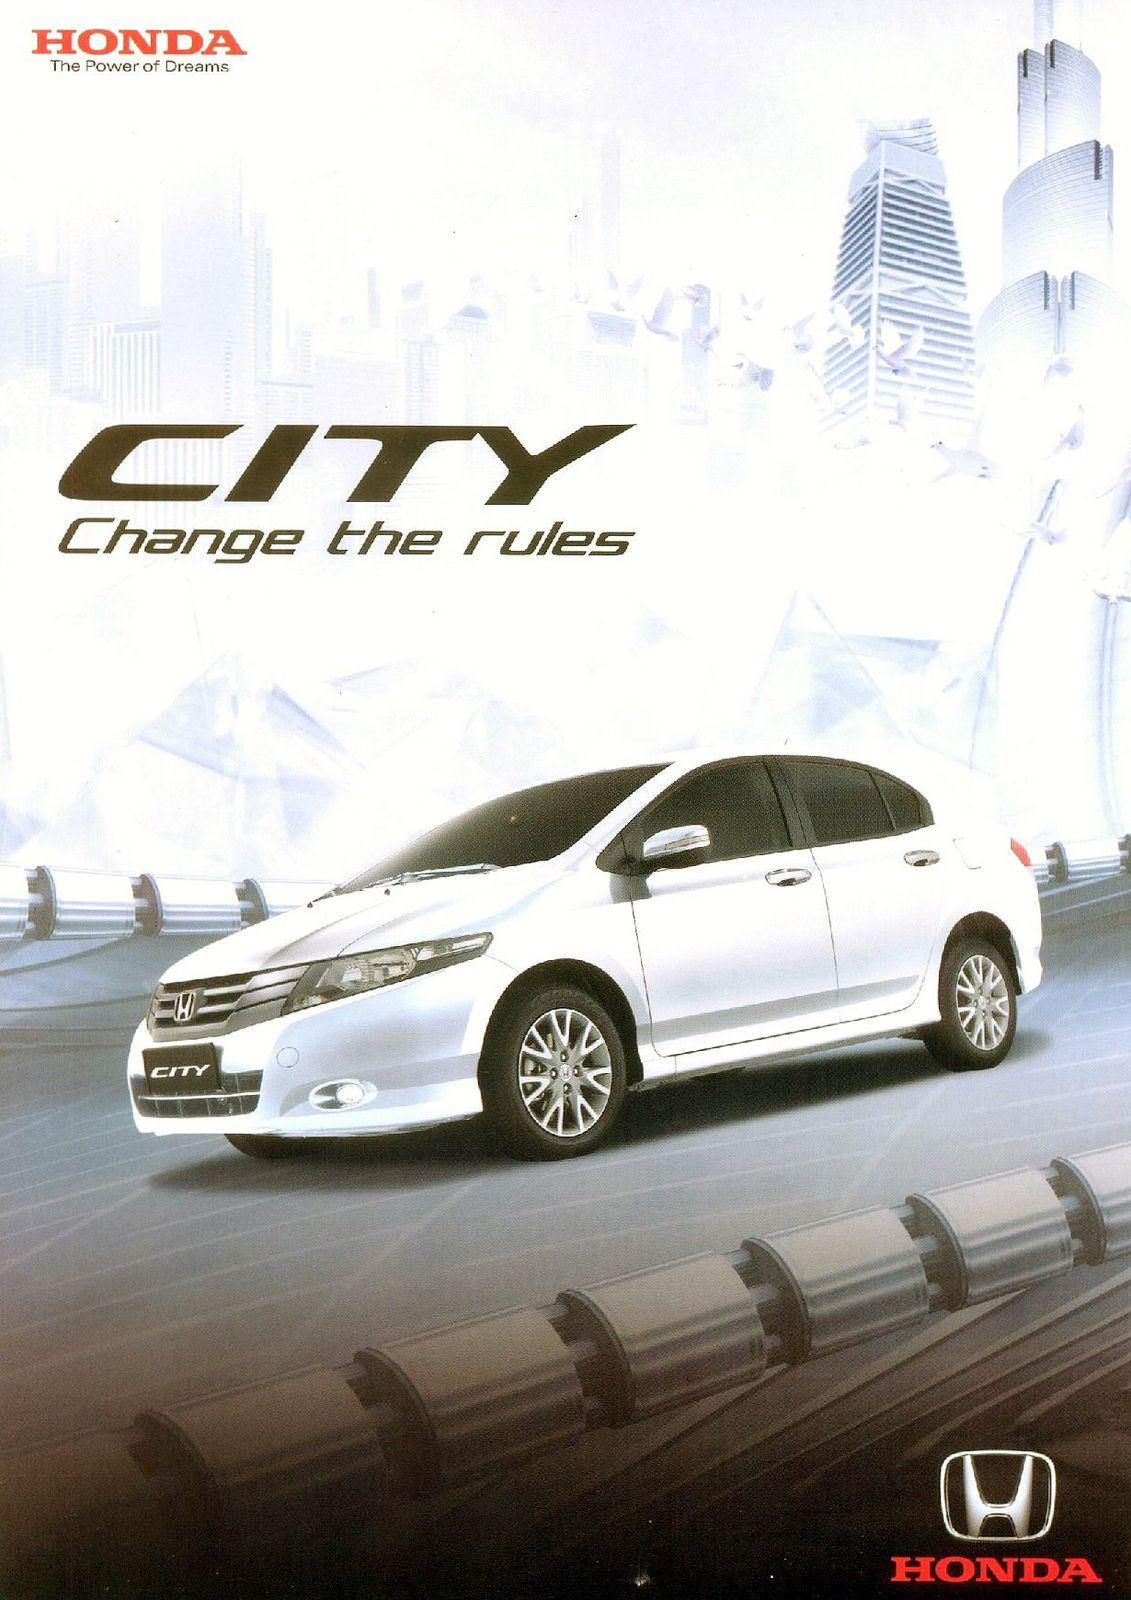 Honda City Mk5 Philippines Brochure 2010 In 2020 Honda City Honda City